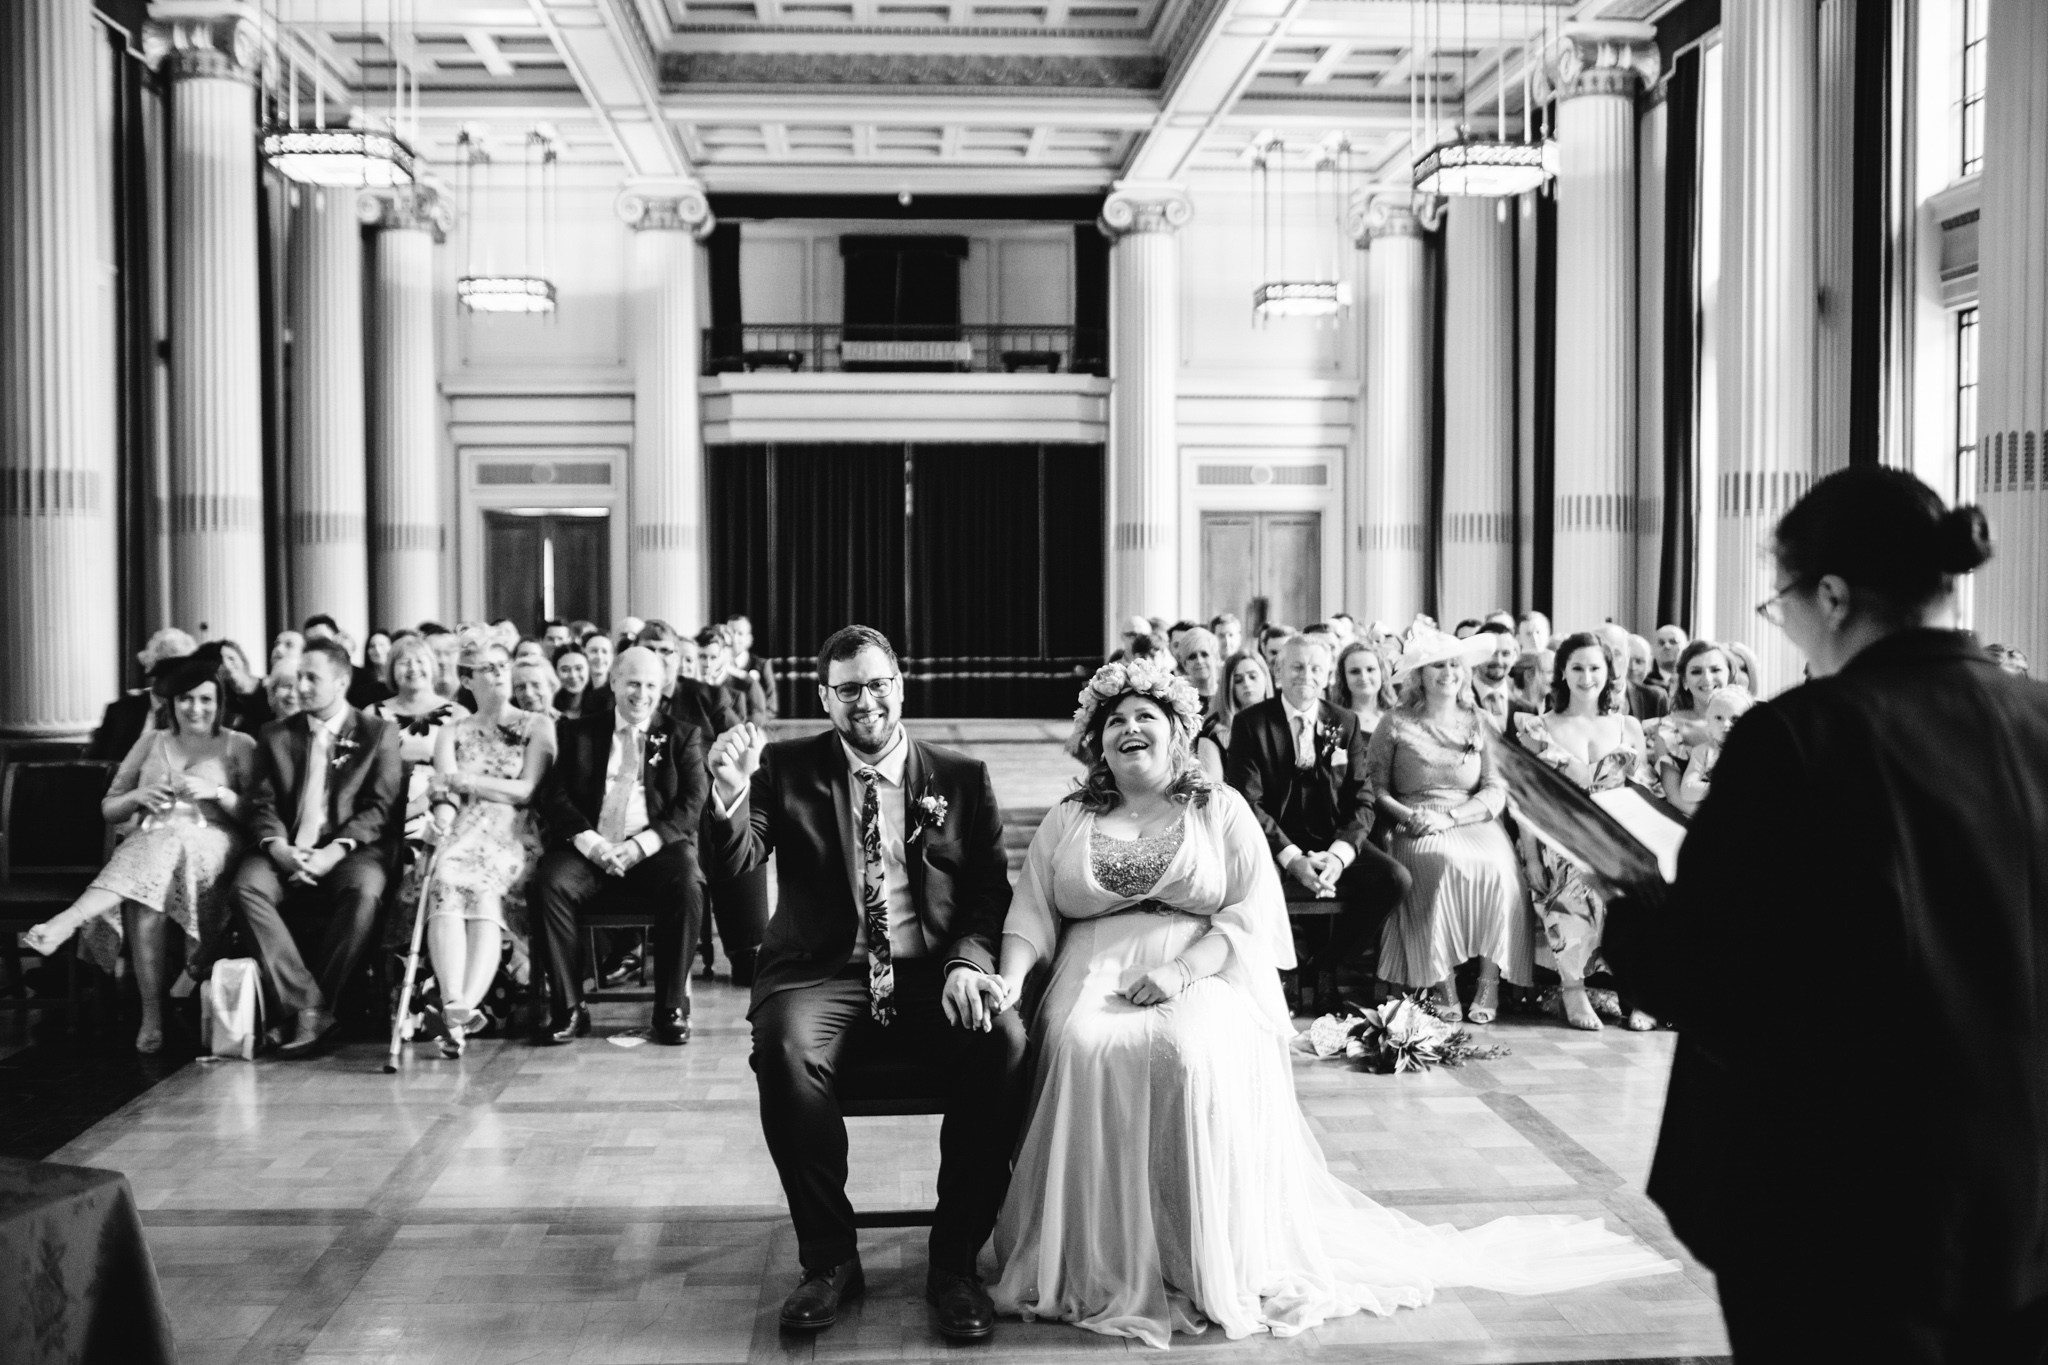 derbyshire-wedding-photographer-videographer-camera-hannah-38.jpg